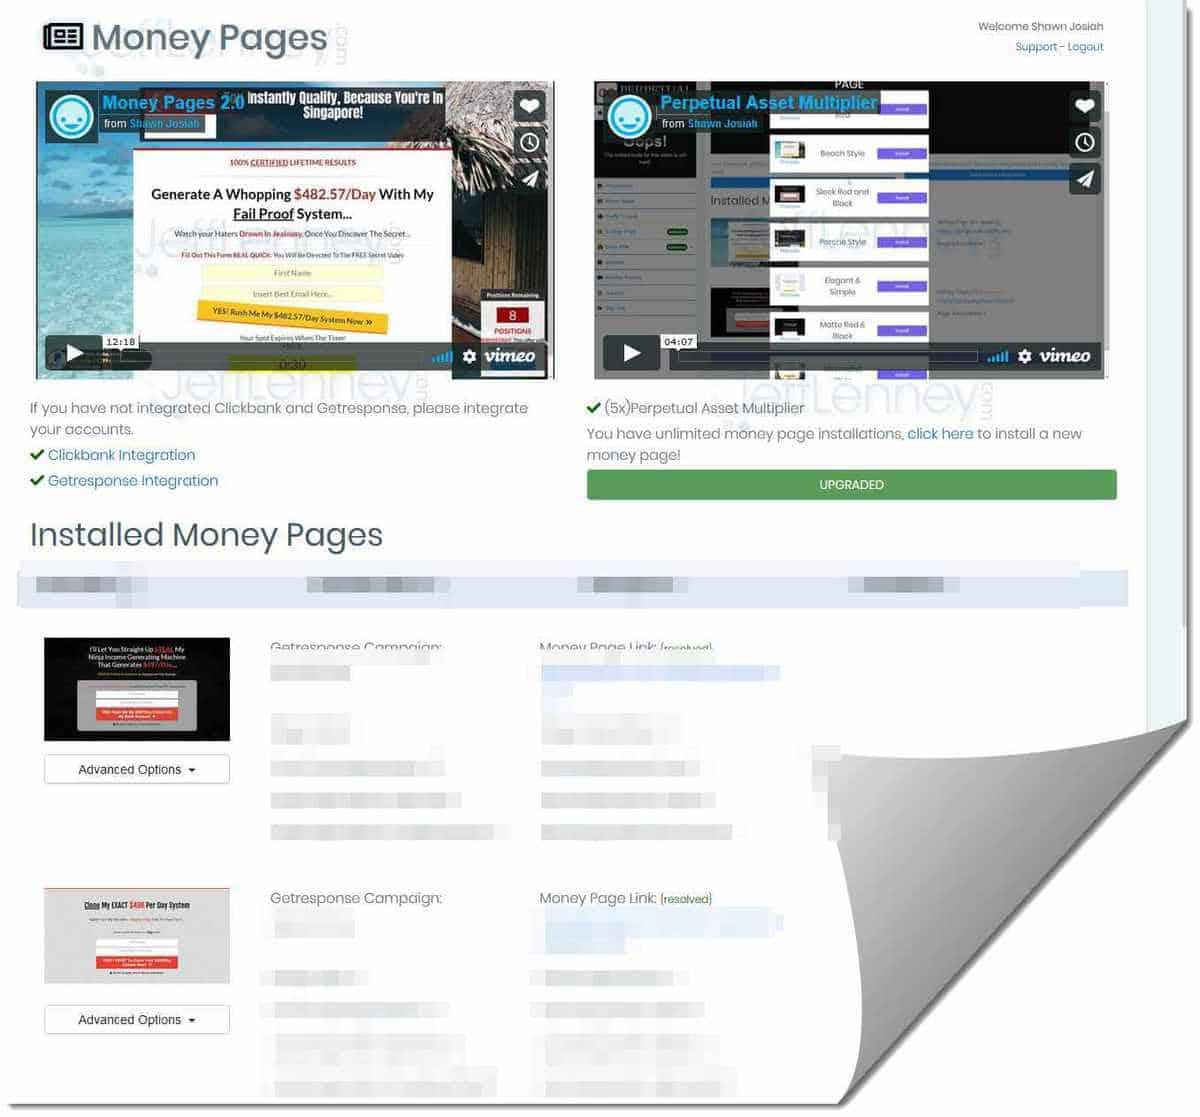 P.I. Money Pages!